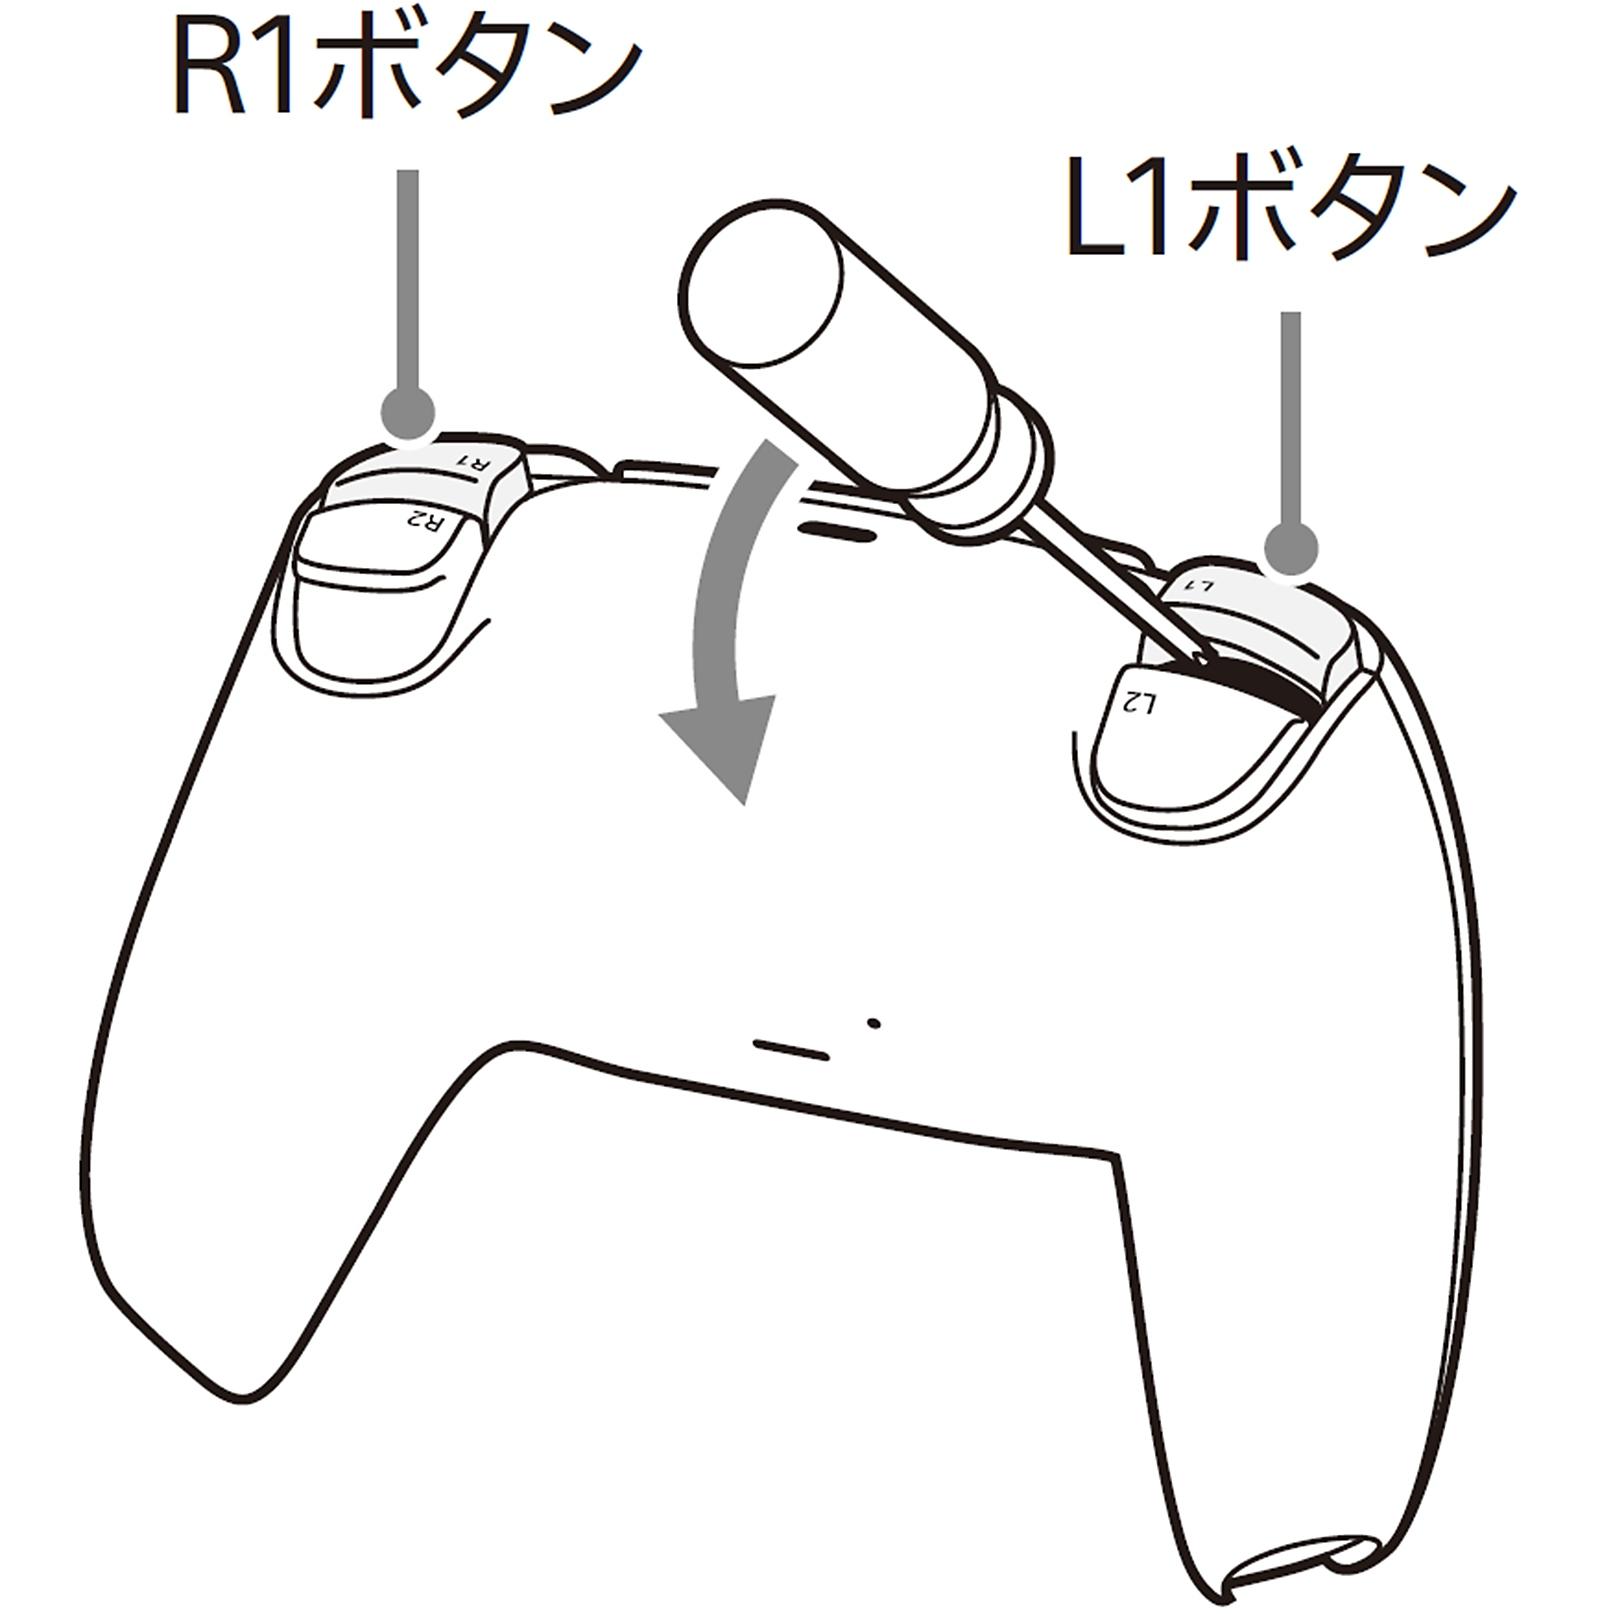 CFI-ZCT1J-image-block-remove-battery-02-ja-jp-28apr21.PNG